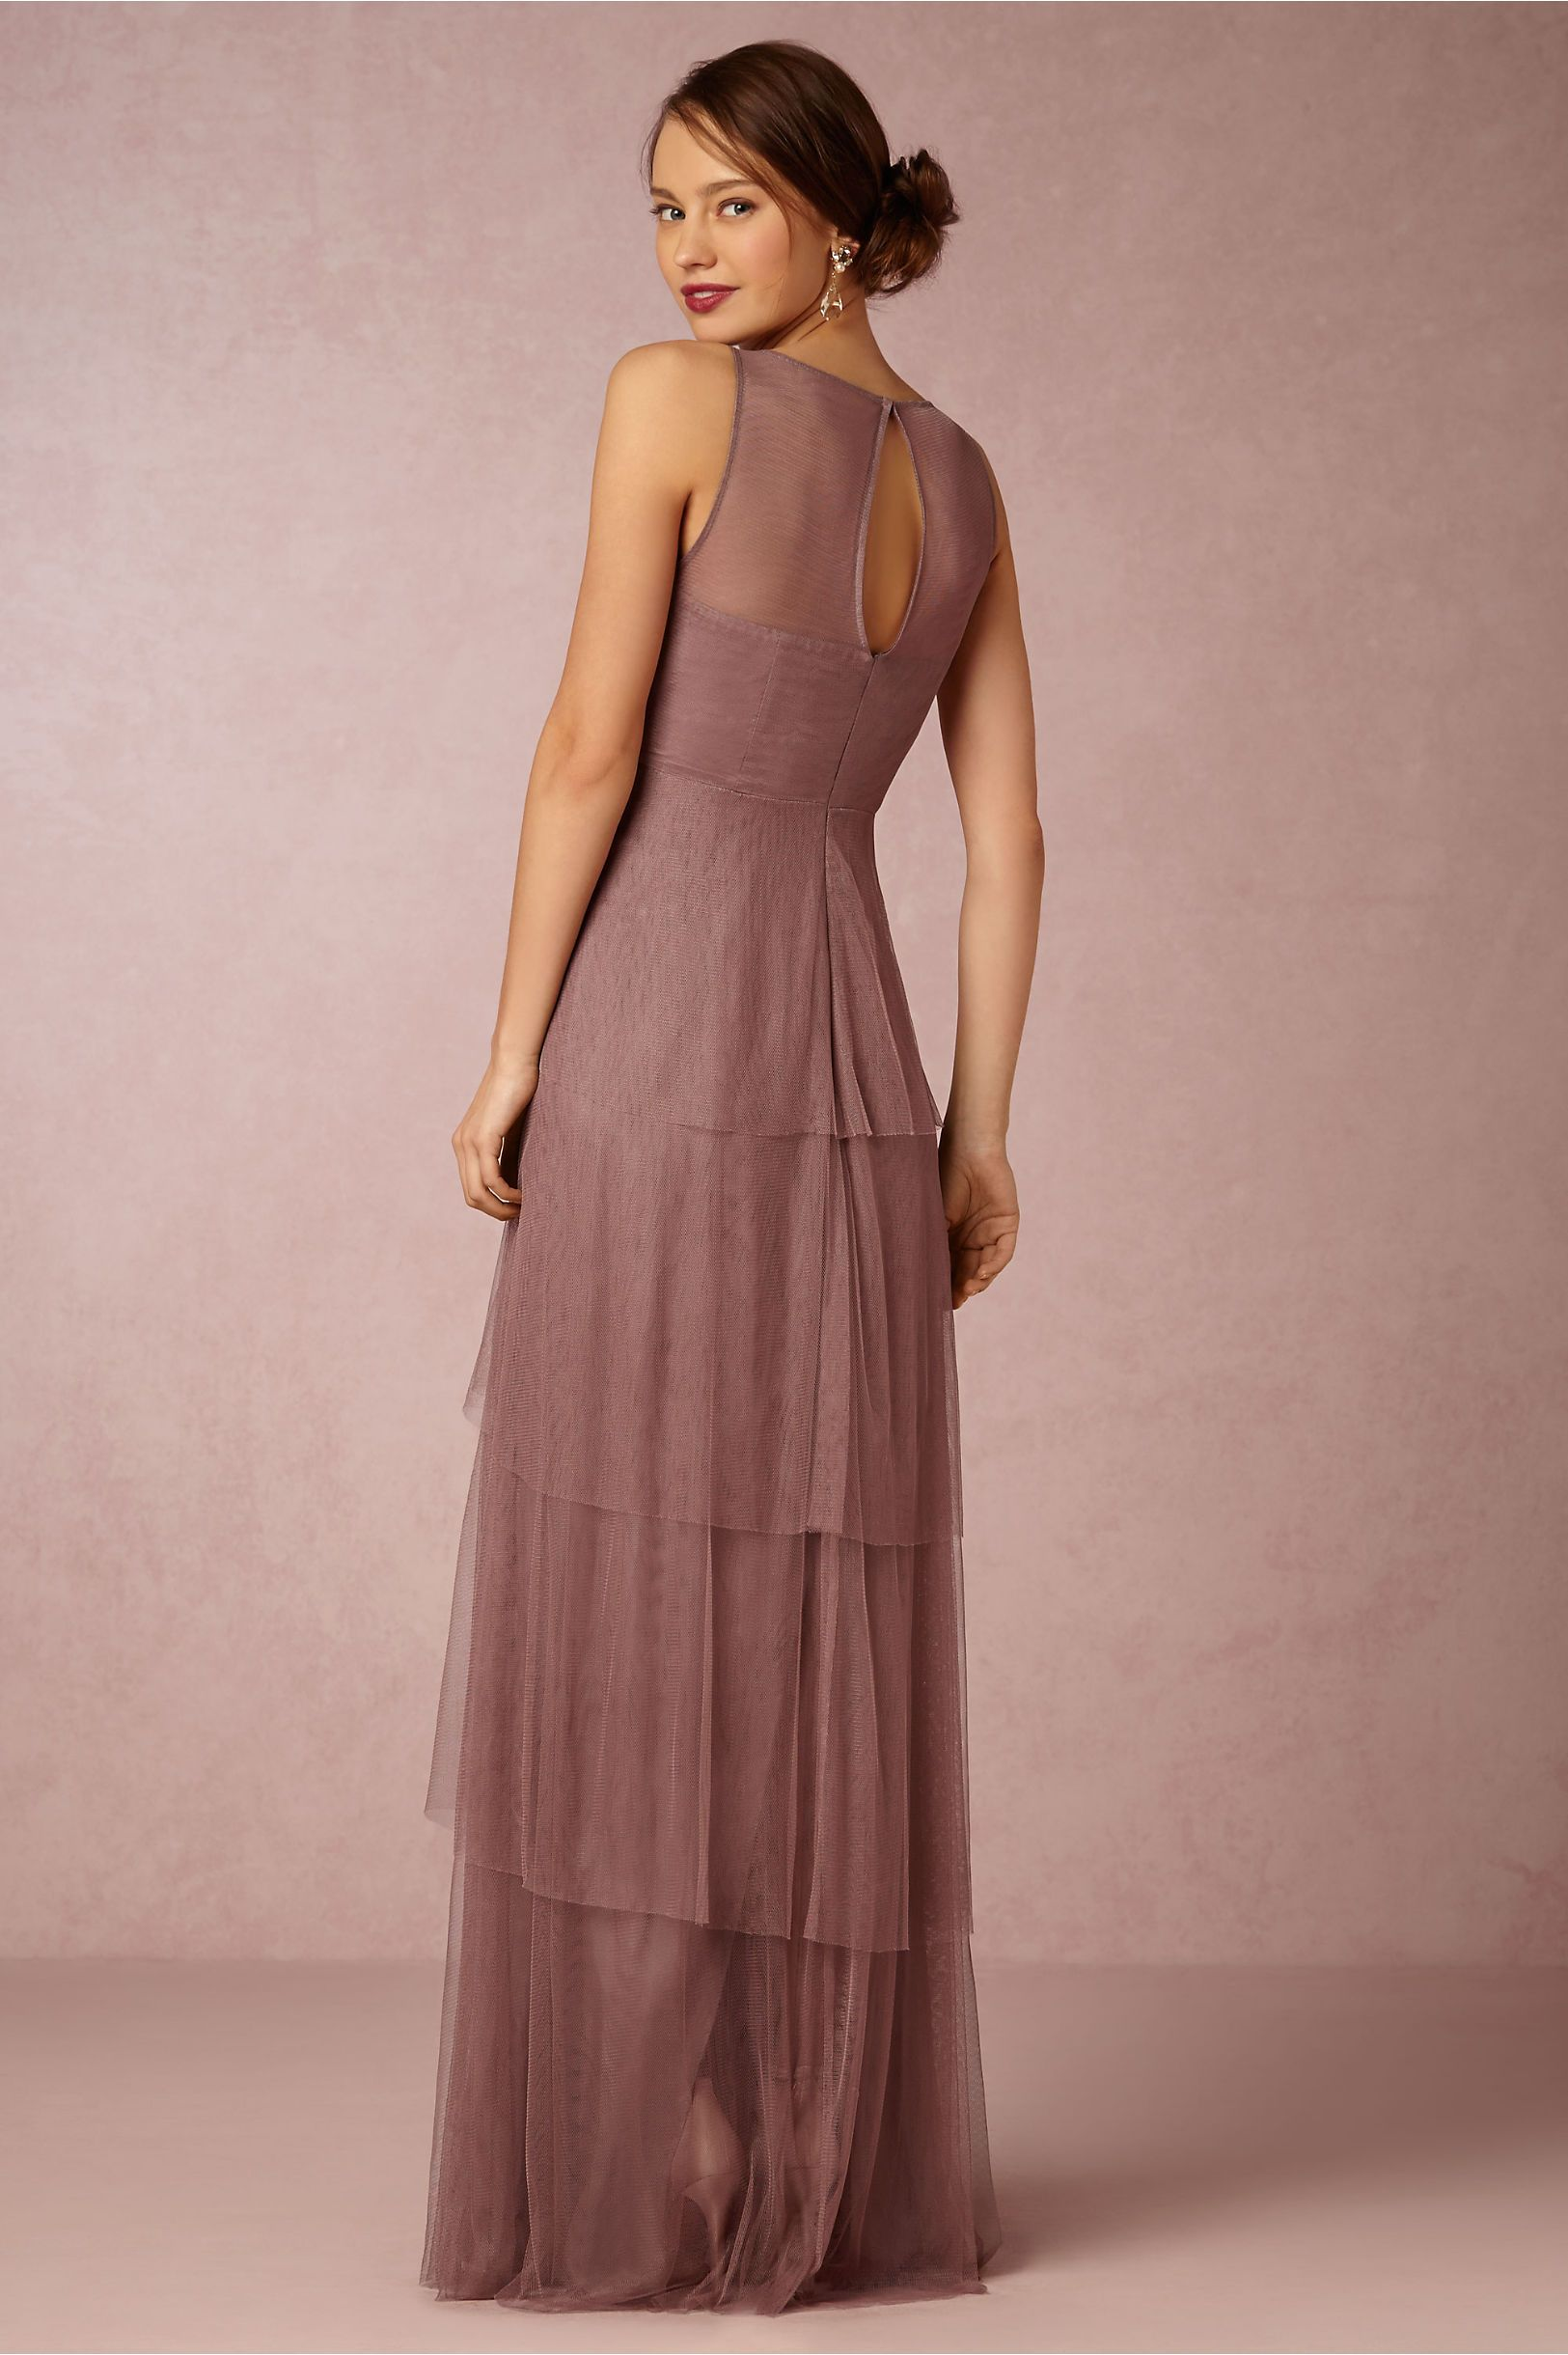 Sleeveless Illusion Bateau Neck A-line Tiered Tulle Bridesmaid Dress ...